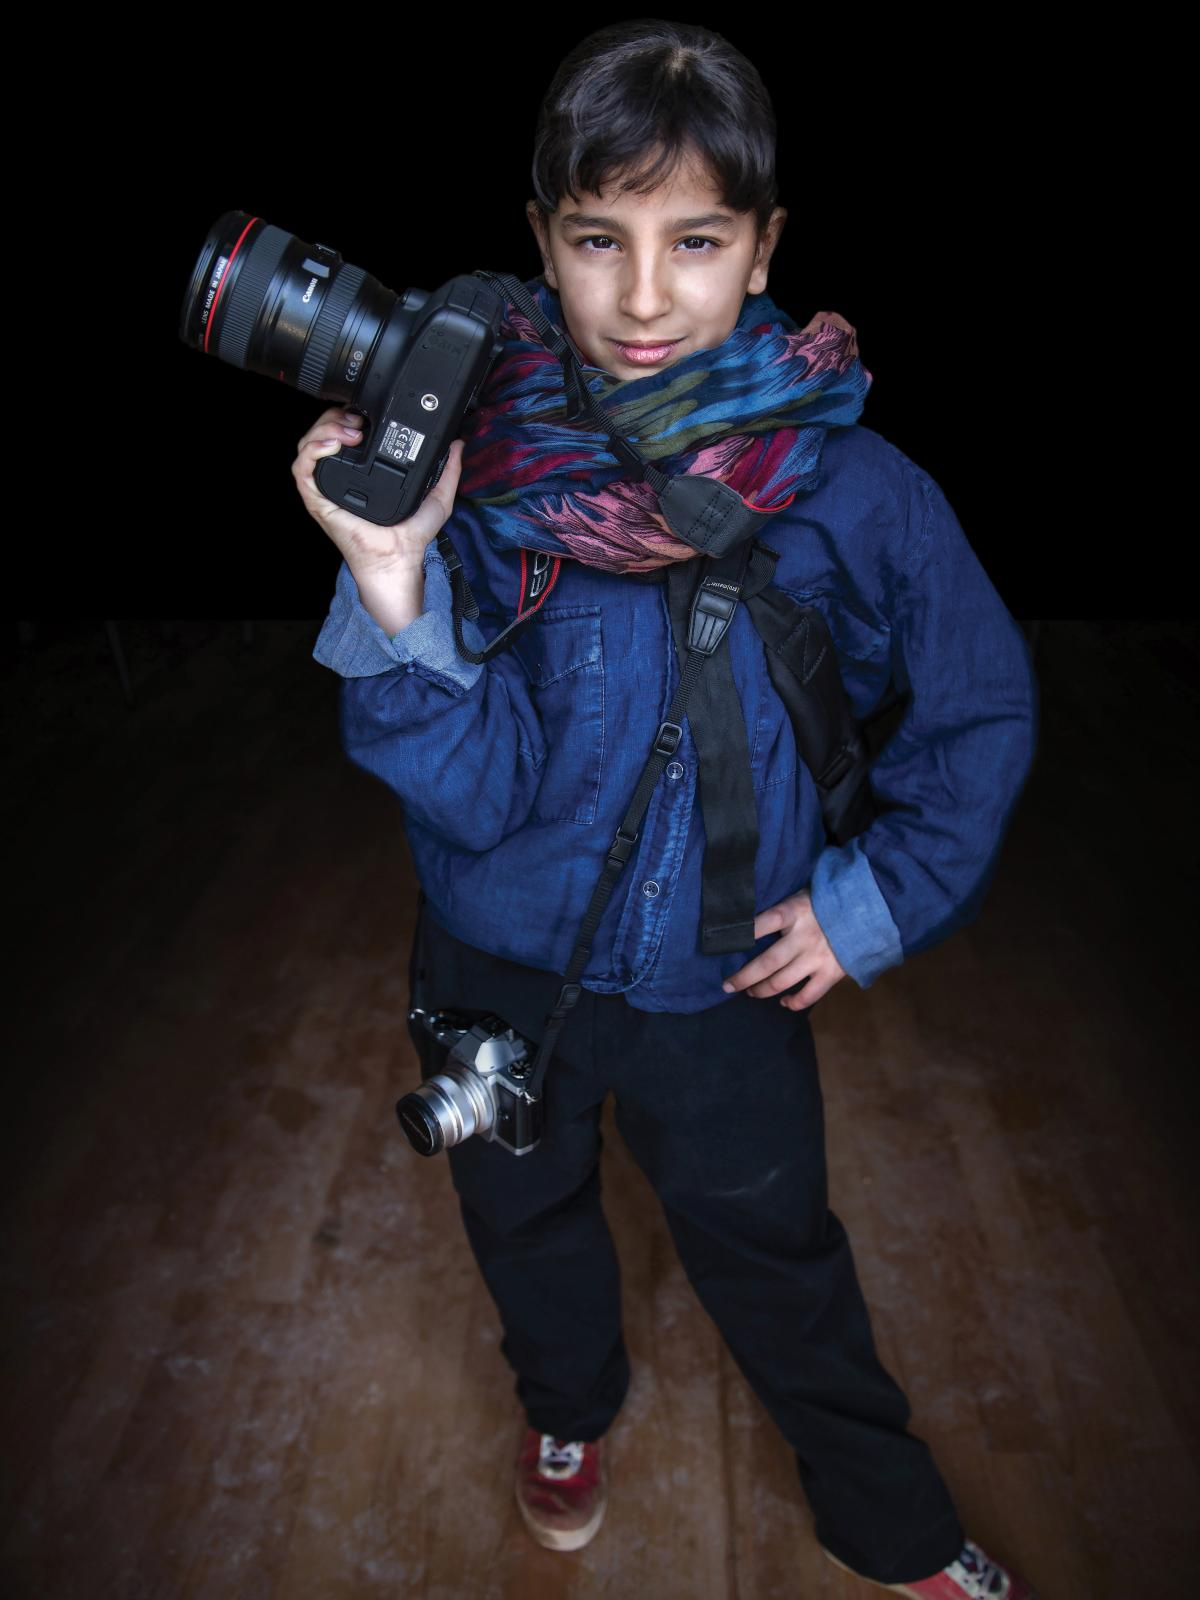 muntaha-age-12-vision-future-photograper